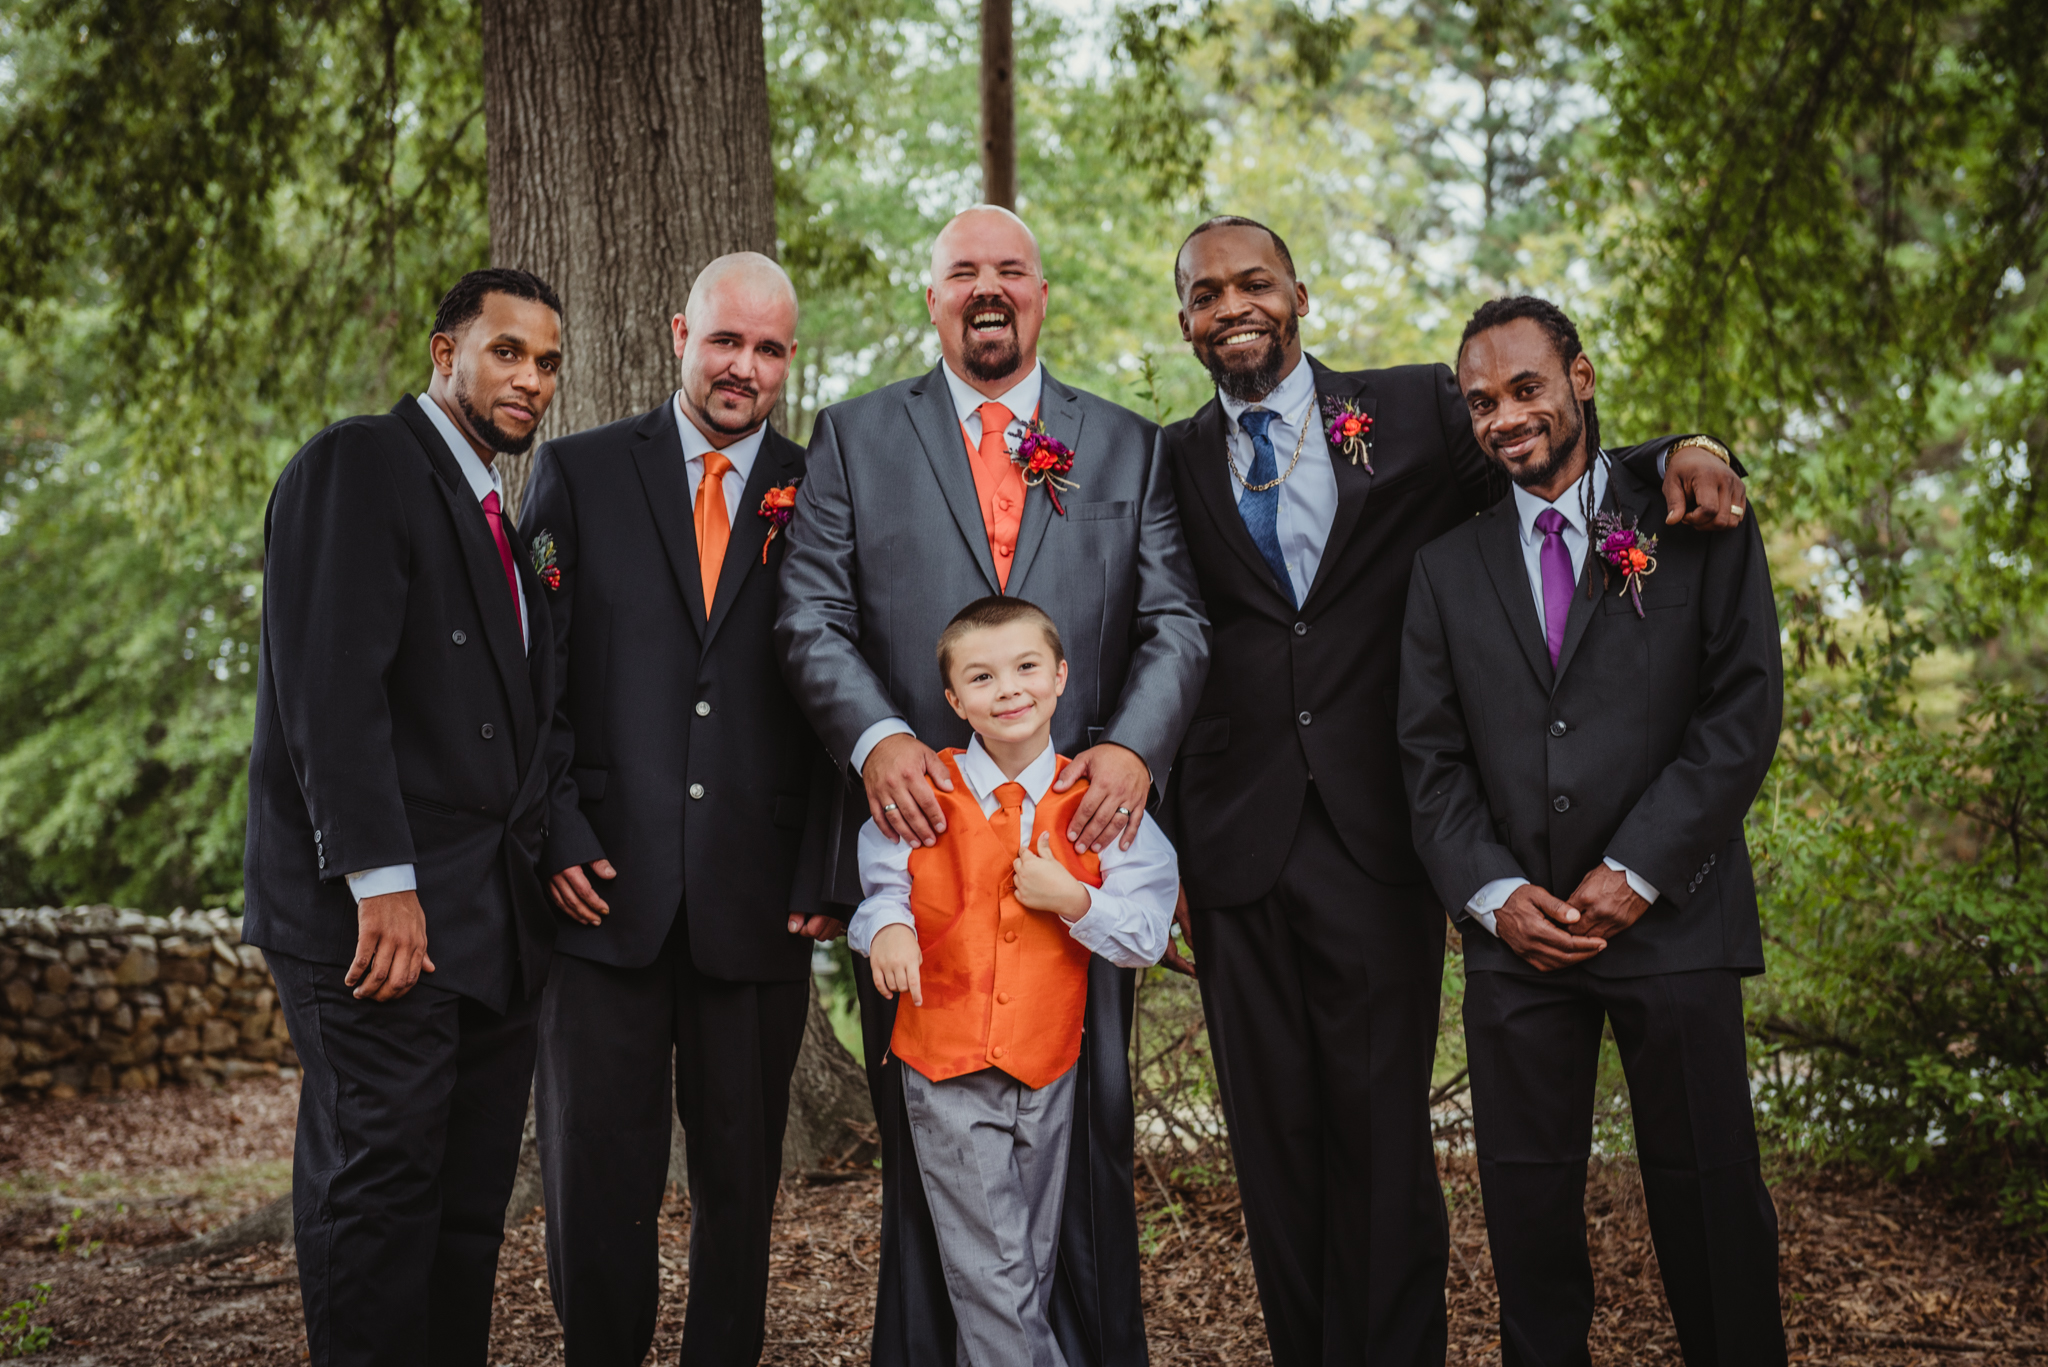 raleigh-wedding-groomsmen-portraits-cd-1.jpg